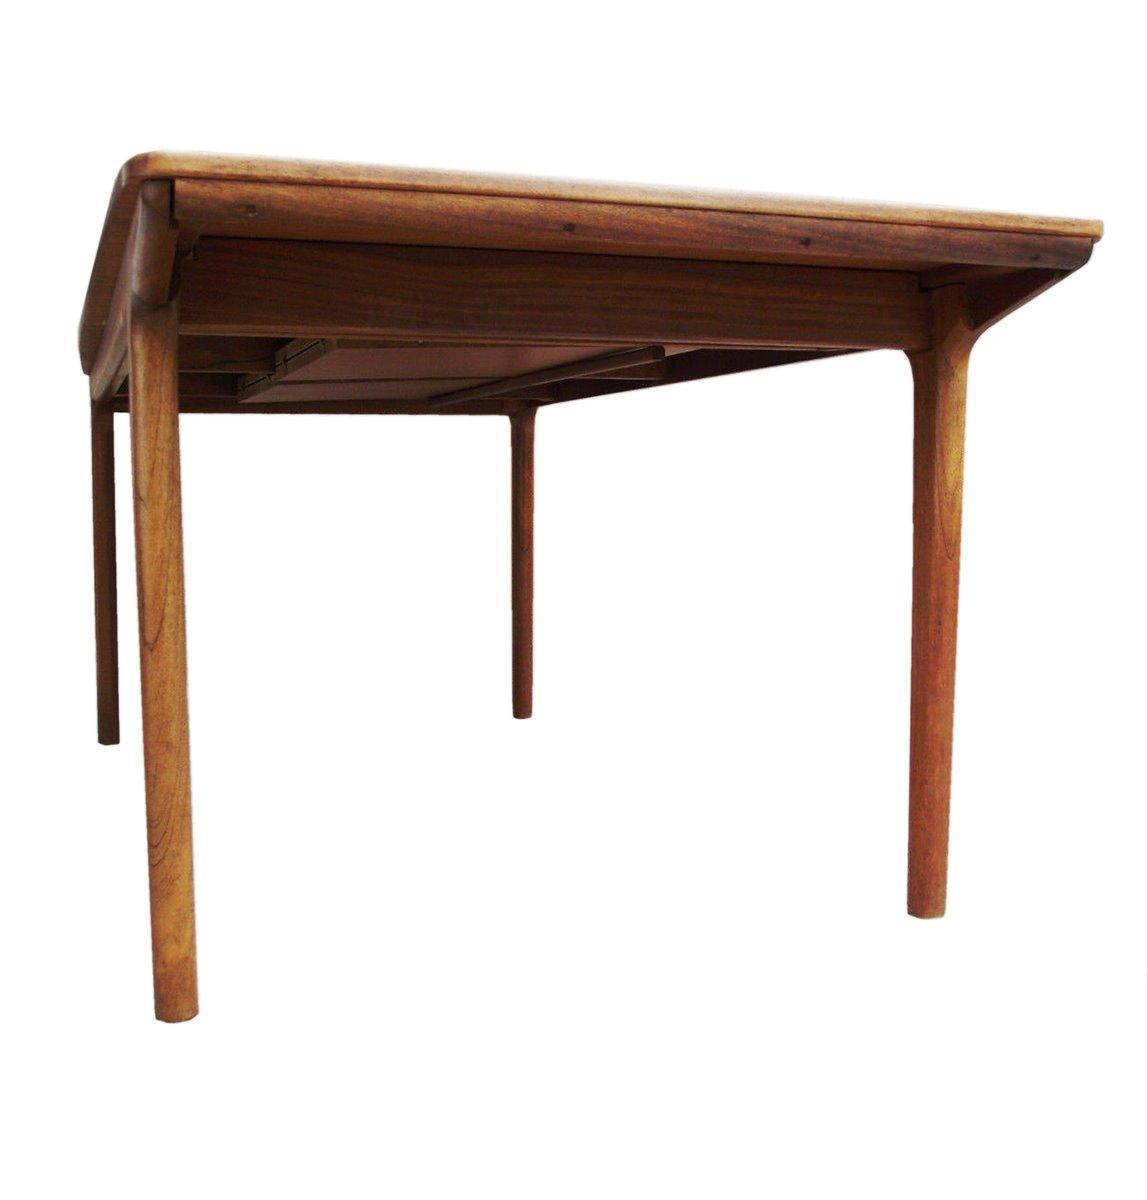 Grande table de salle manger mid century 12 places en for Table salle a manger 4 places